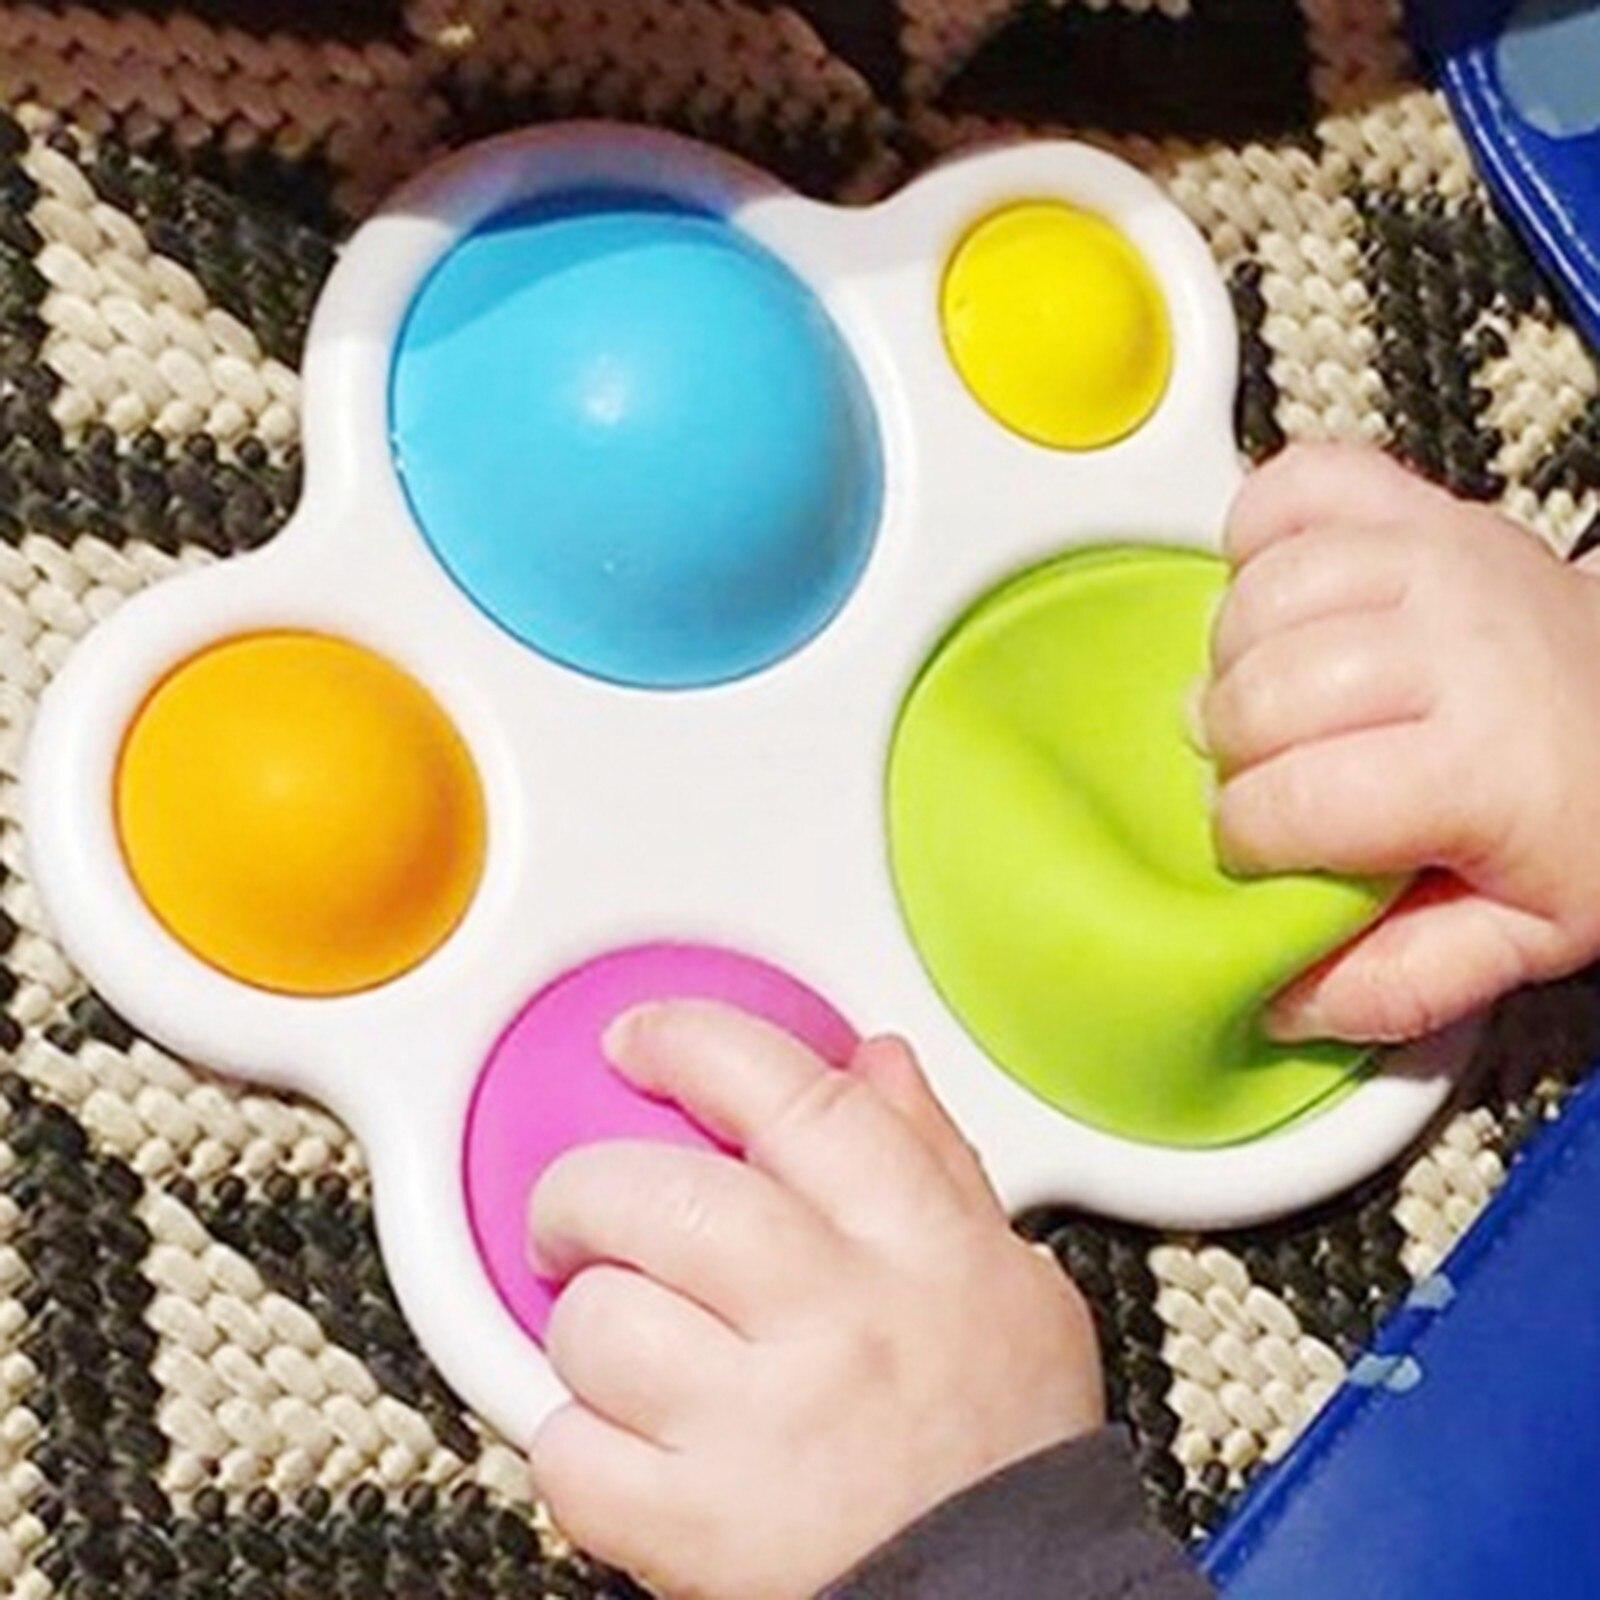 Fat-Brain-Toys Popit Fidge Simple Dimple Infant Intelligence-Development Intensive Early-Education img5